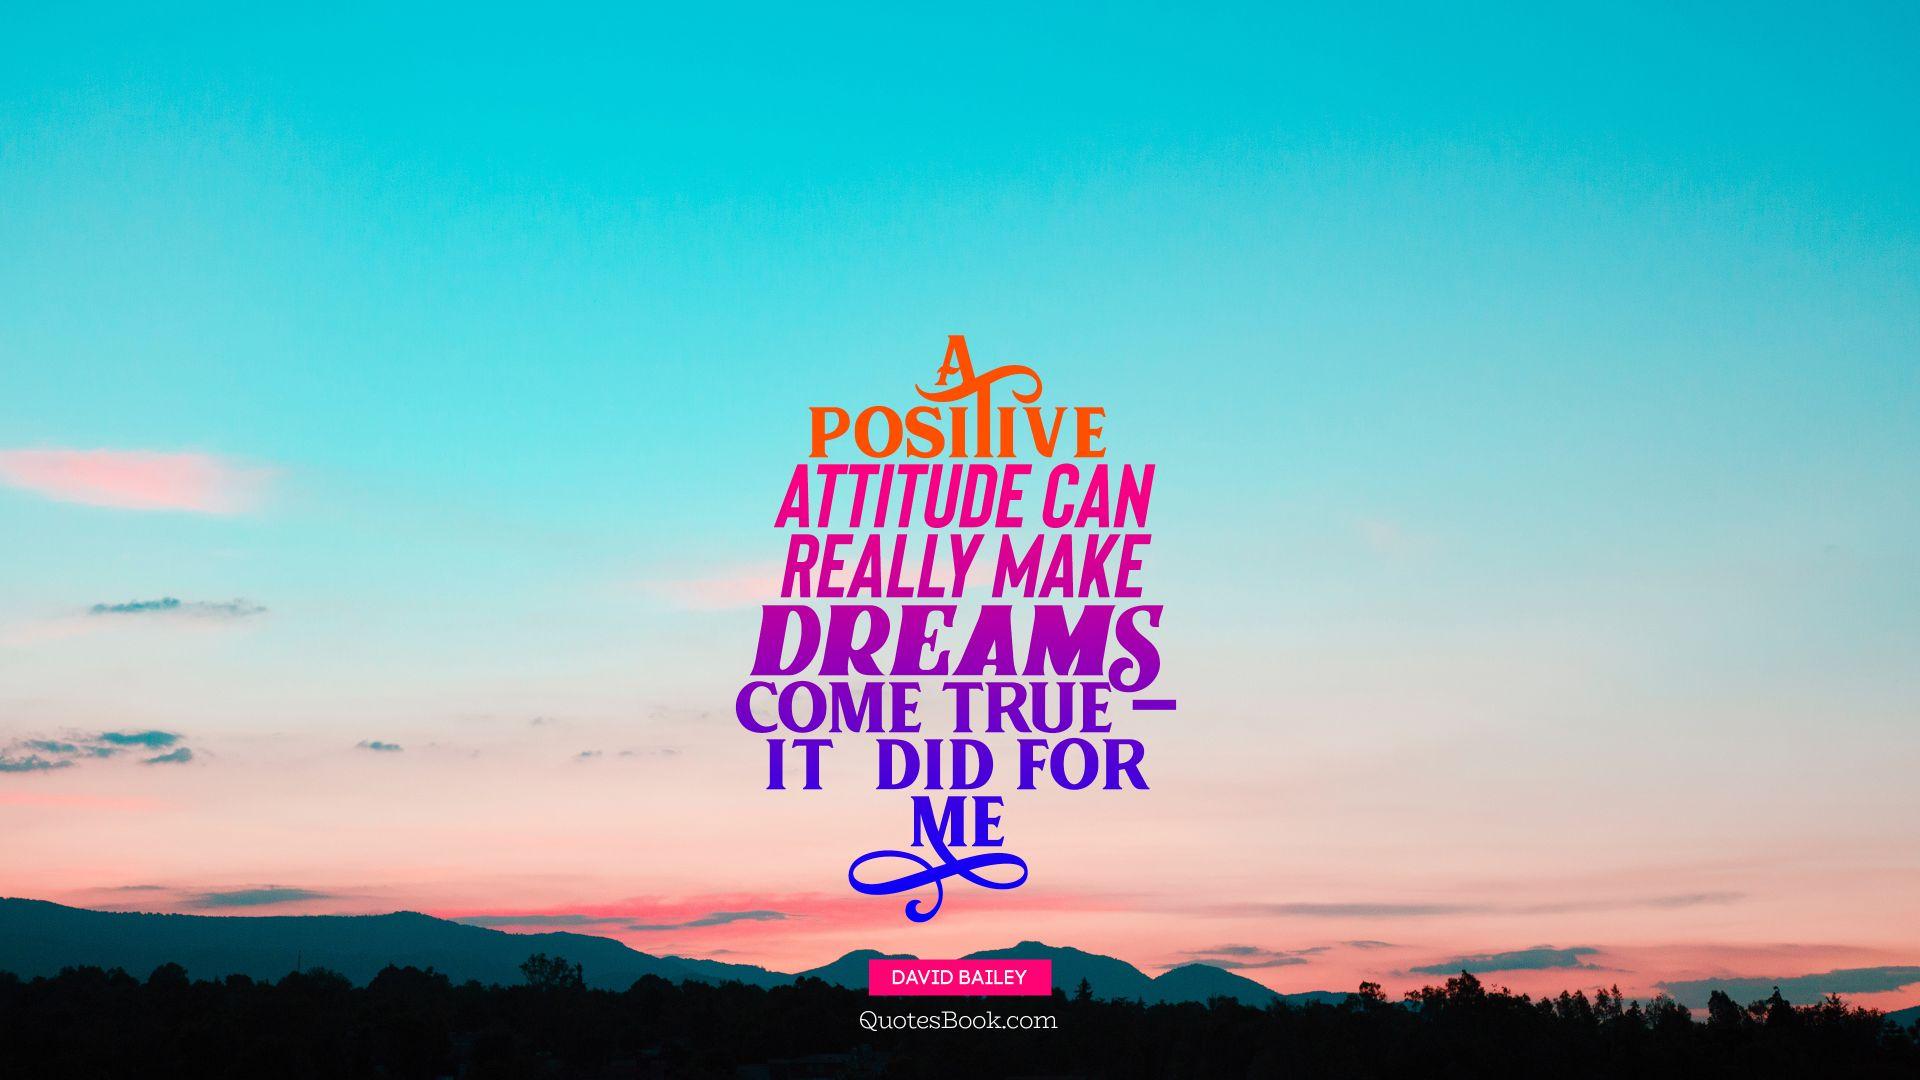 A Positive Attitude Can Really Make Dreams Come True It Did For Me